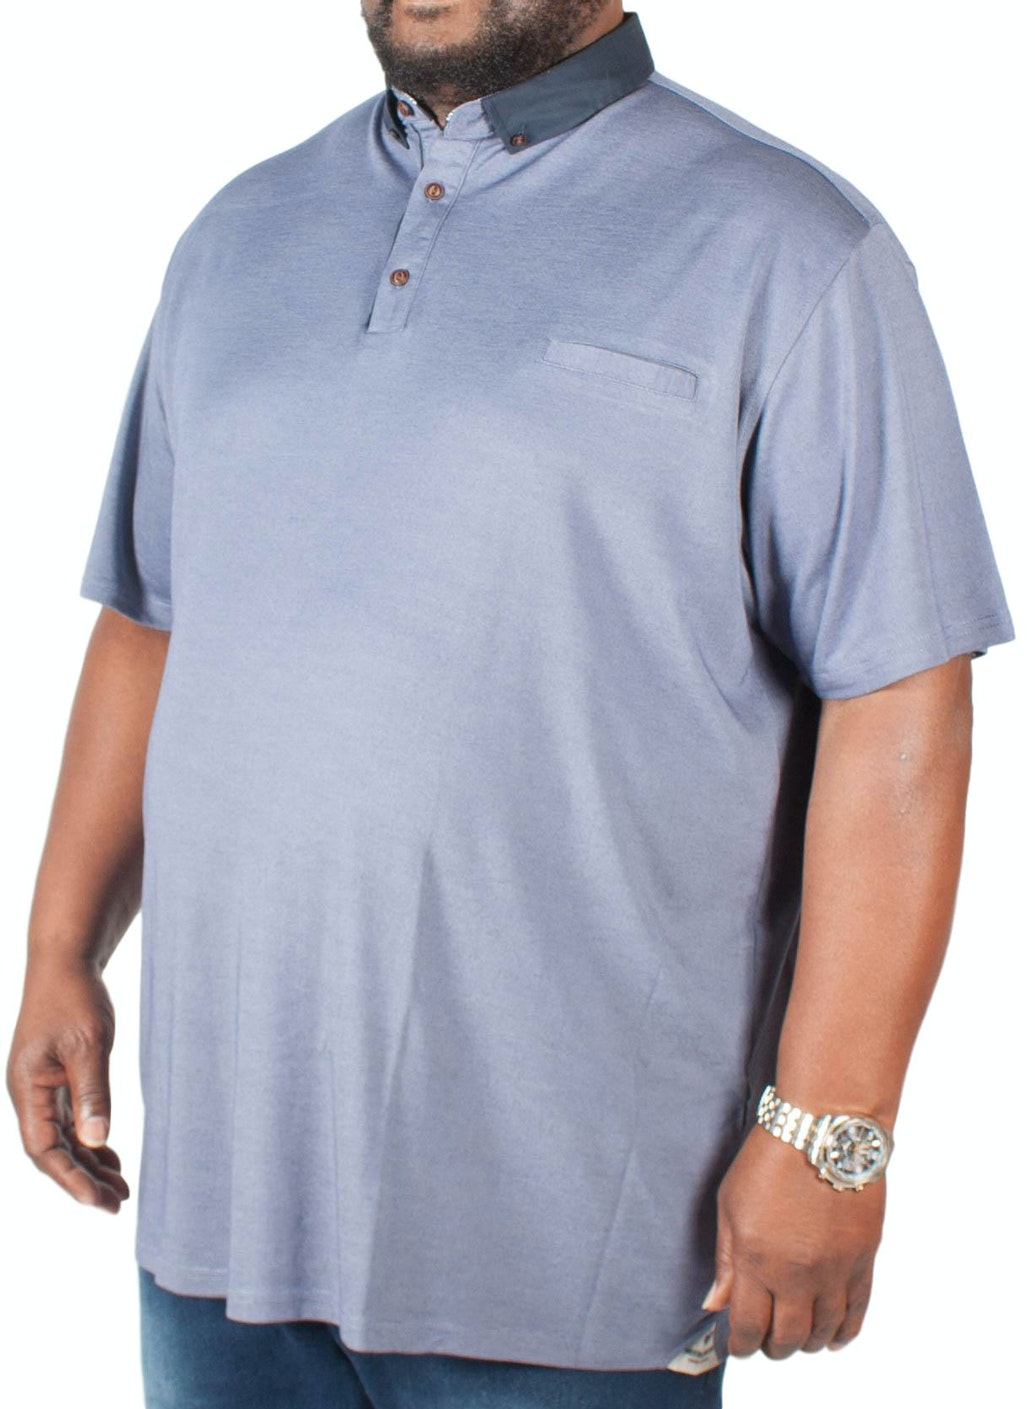 Mish Mash Douglas Polo Shirt Navy